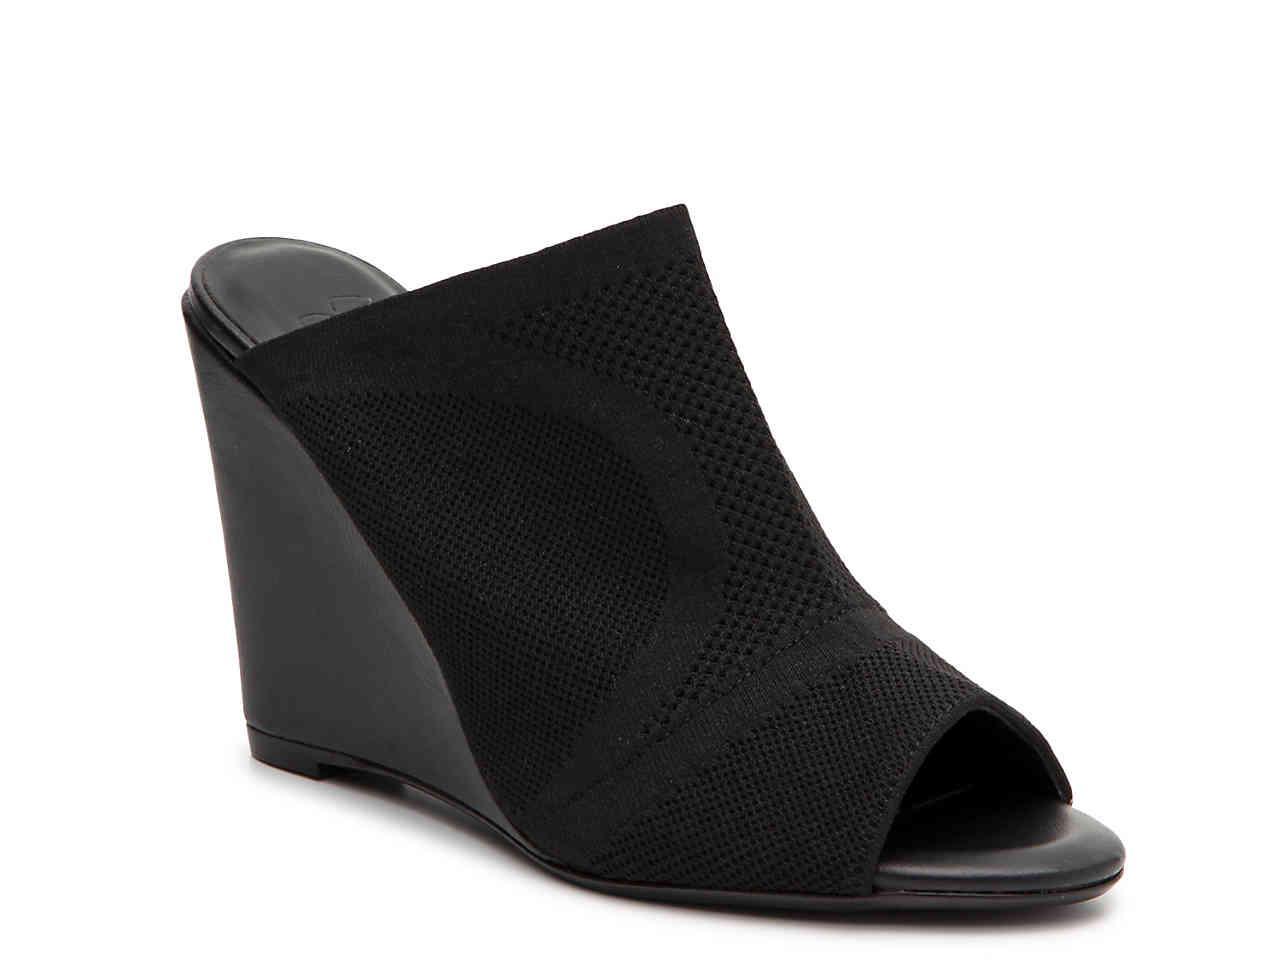 2bbfdeb7cf7c6 Lyst - Joie Anita Wedge Sandal in Black